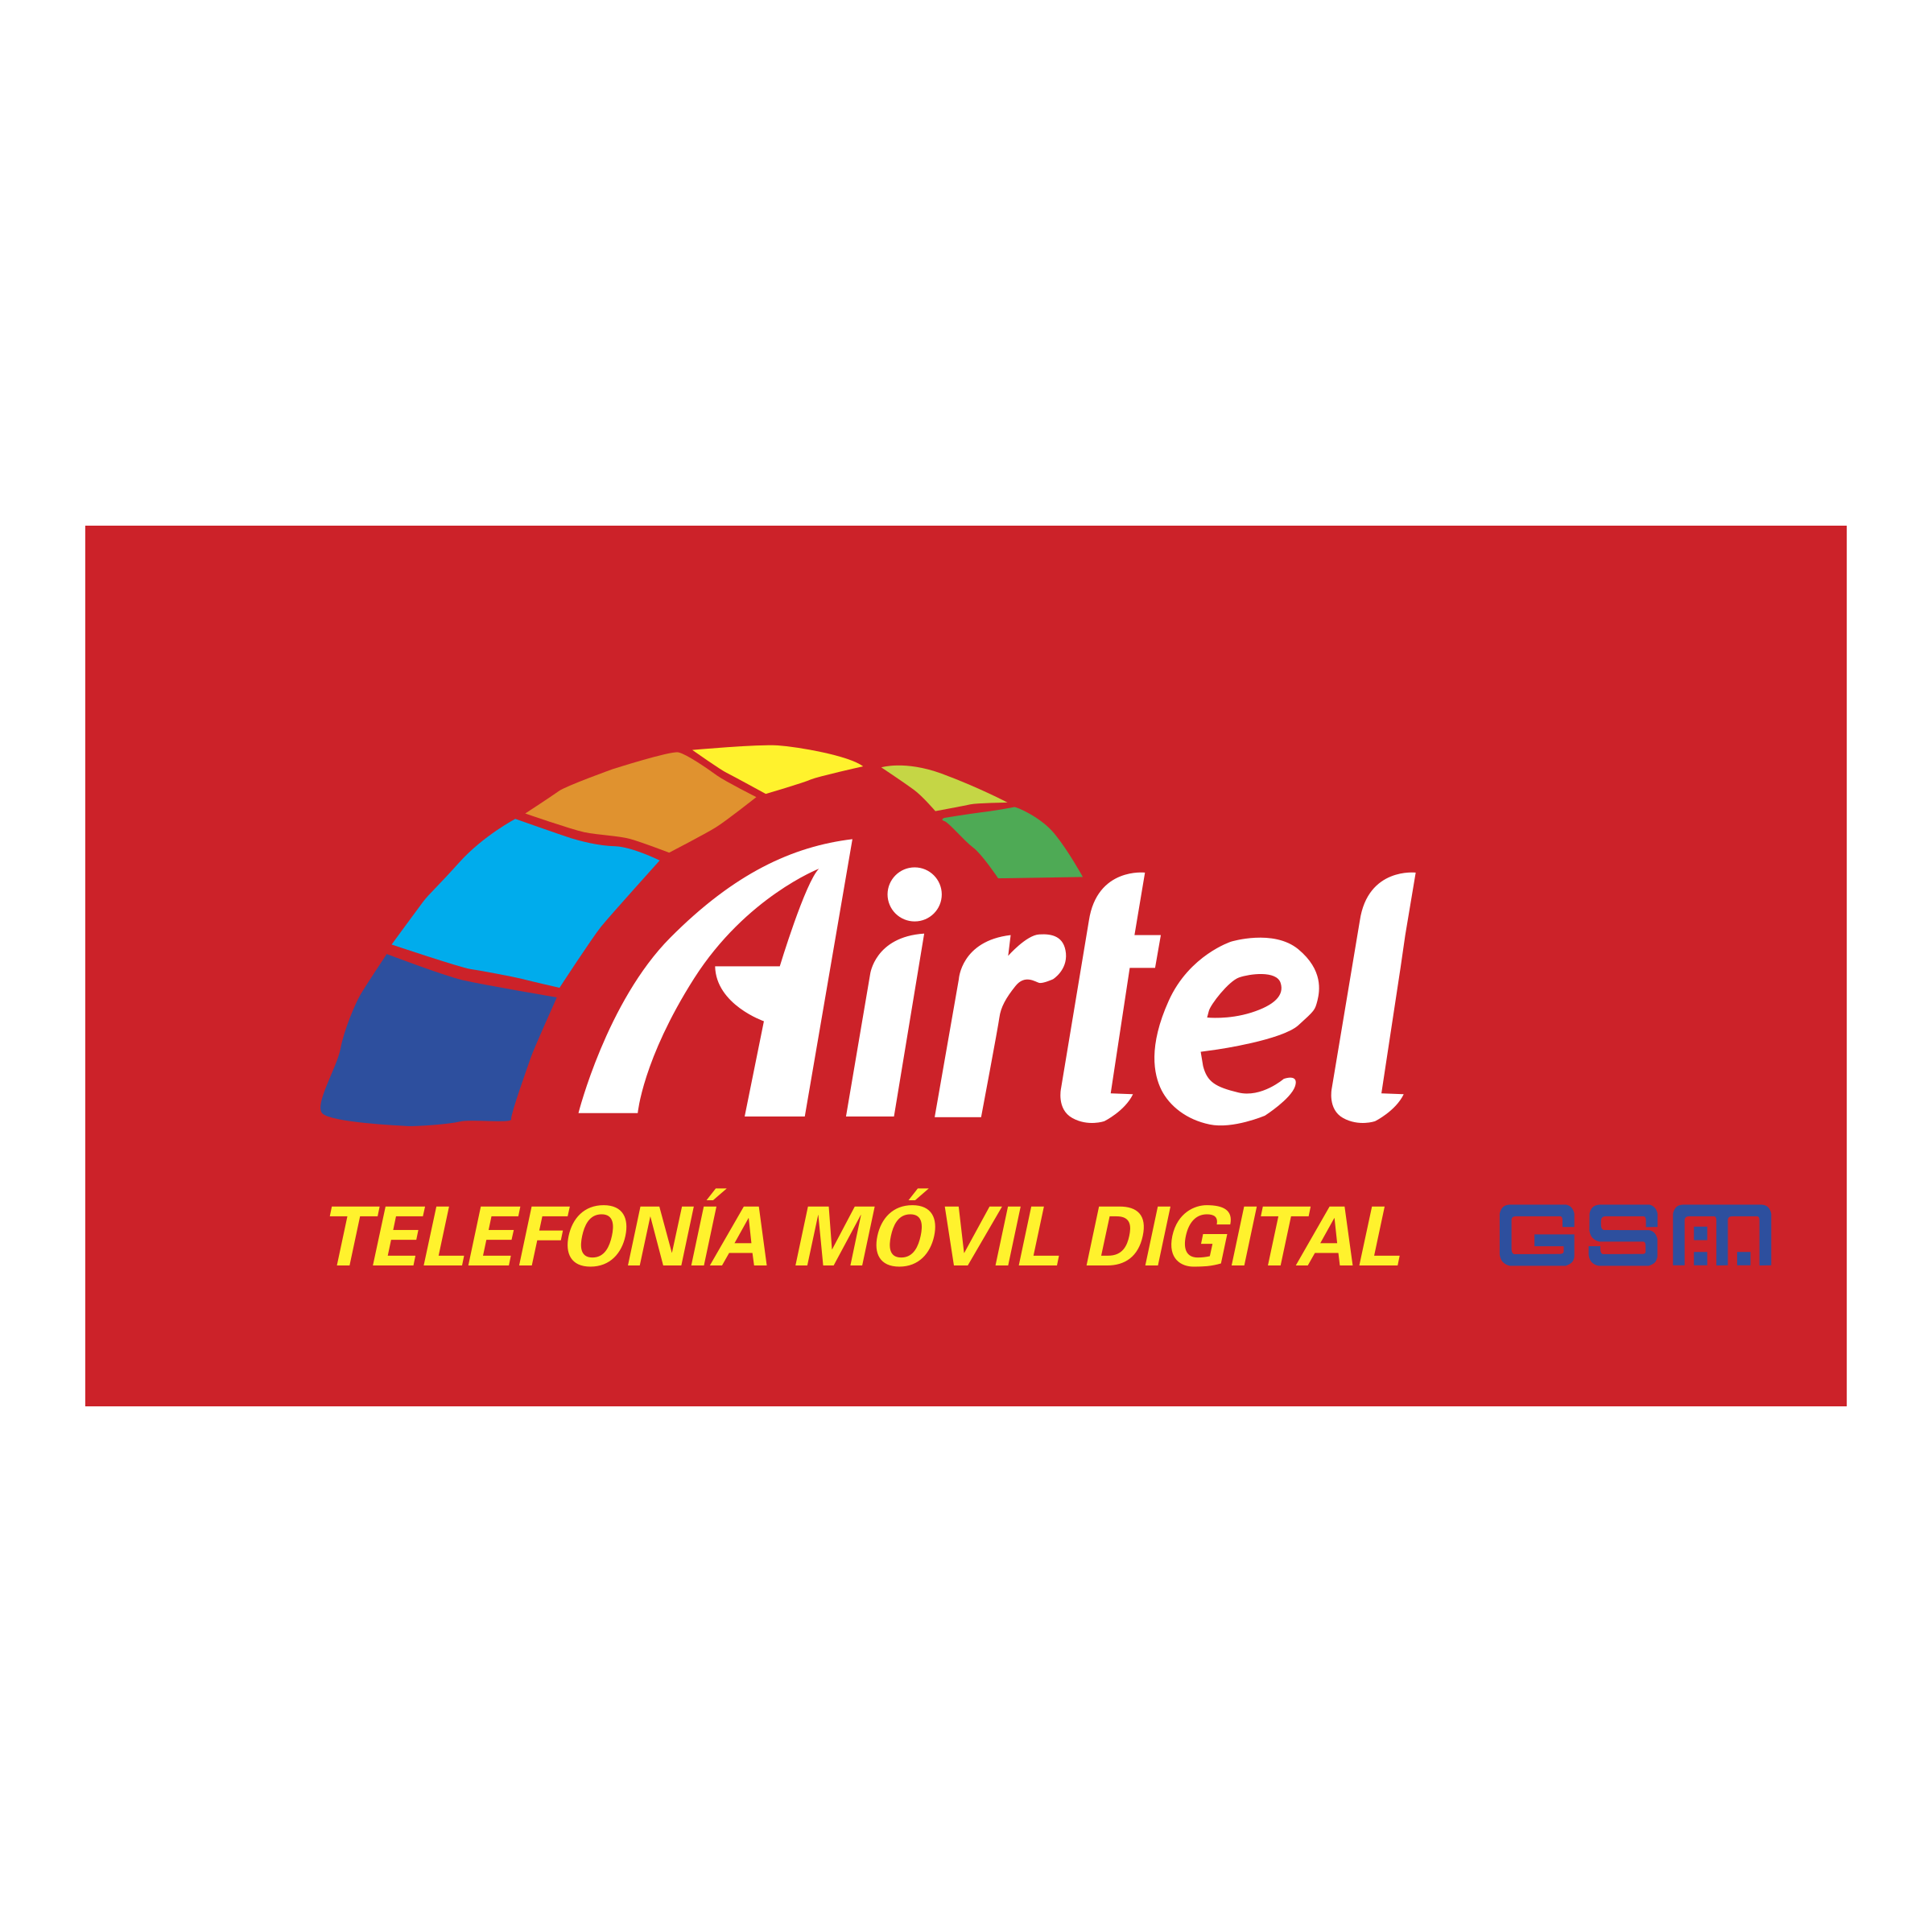 Airtel Logo PNG Transparent & SVG Vector.